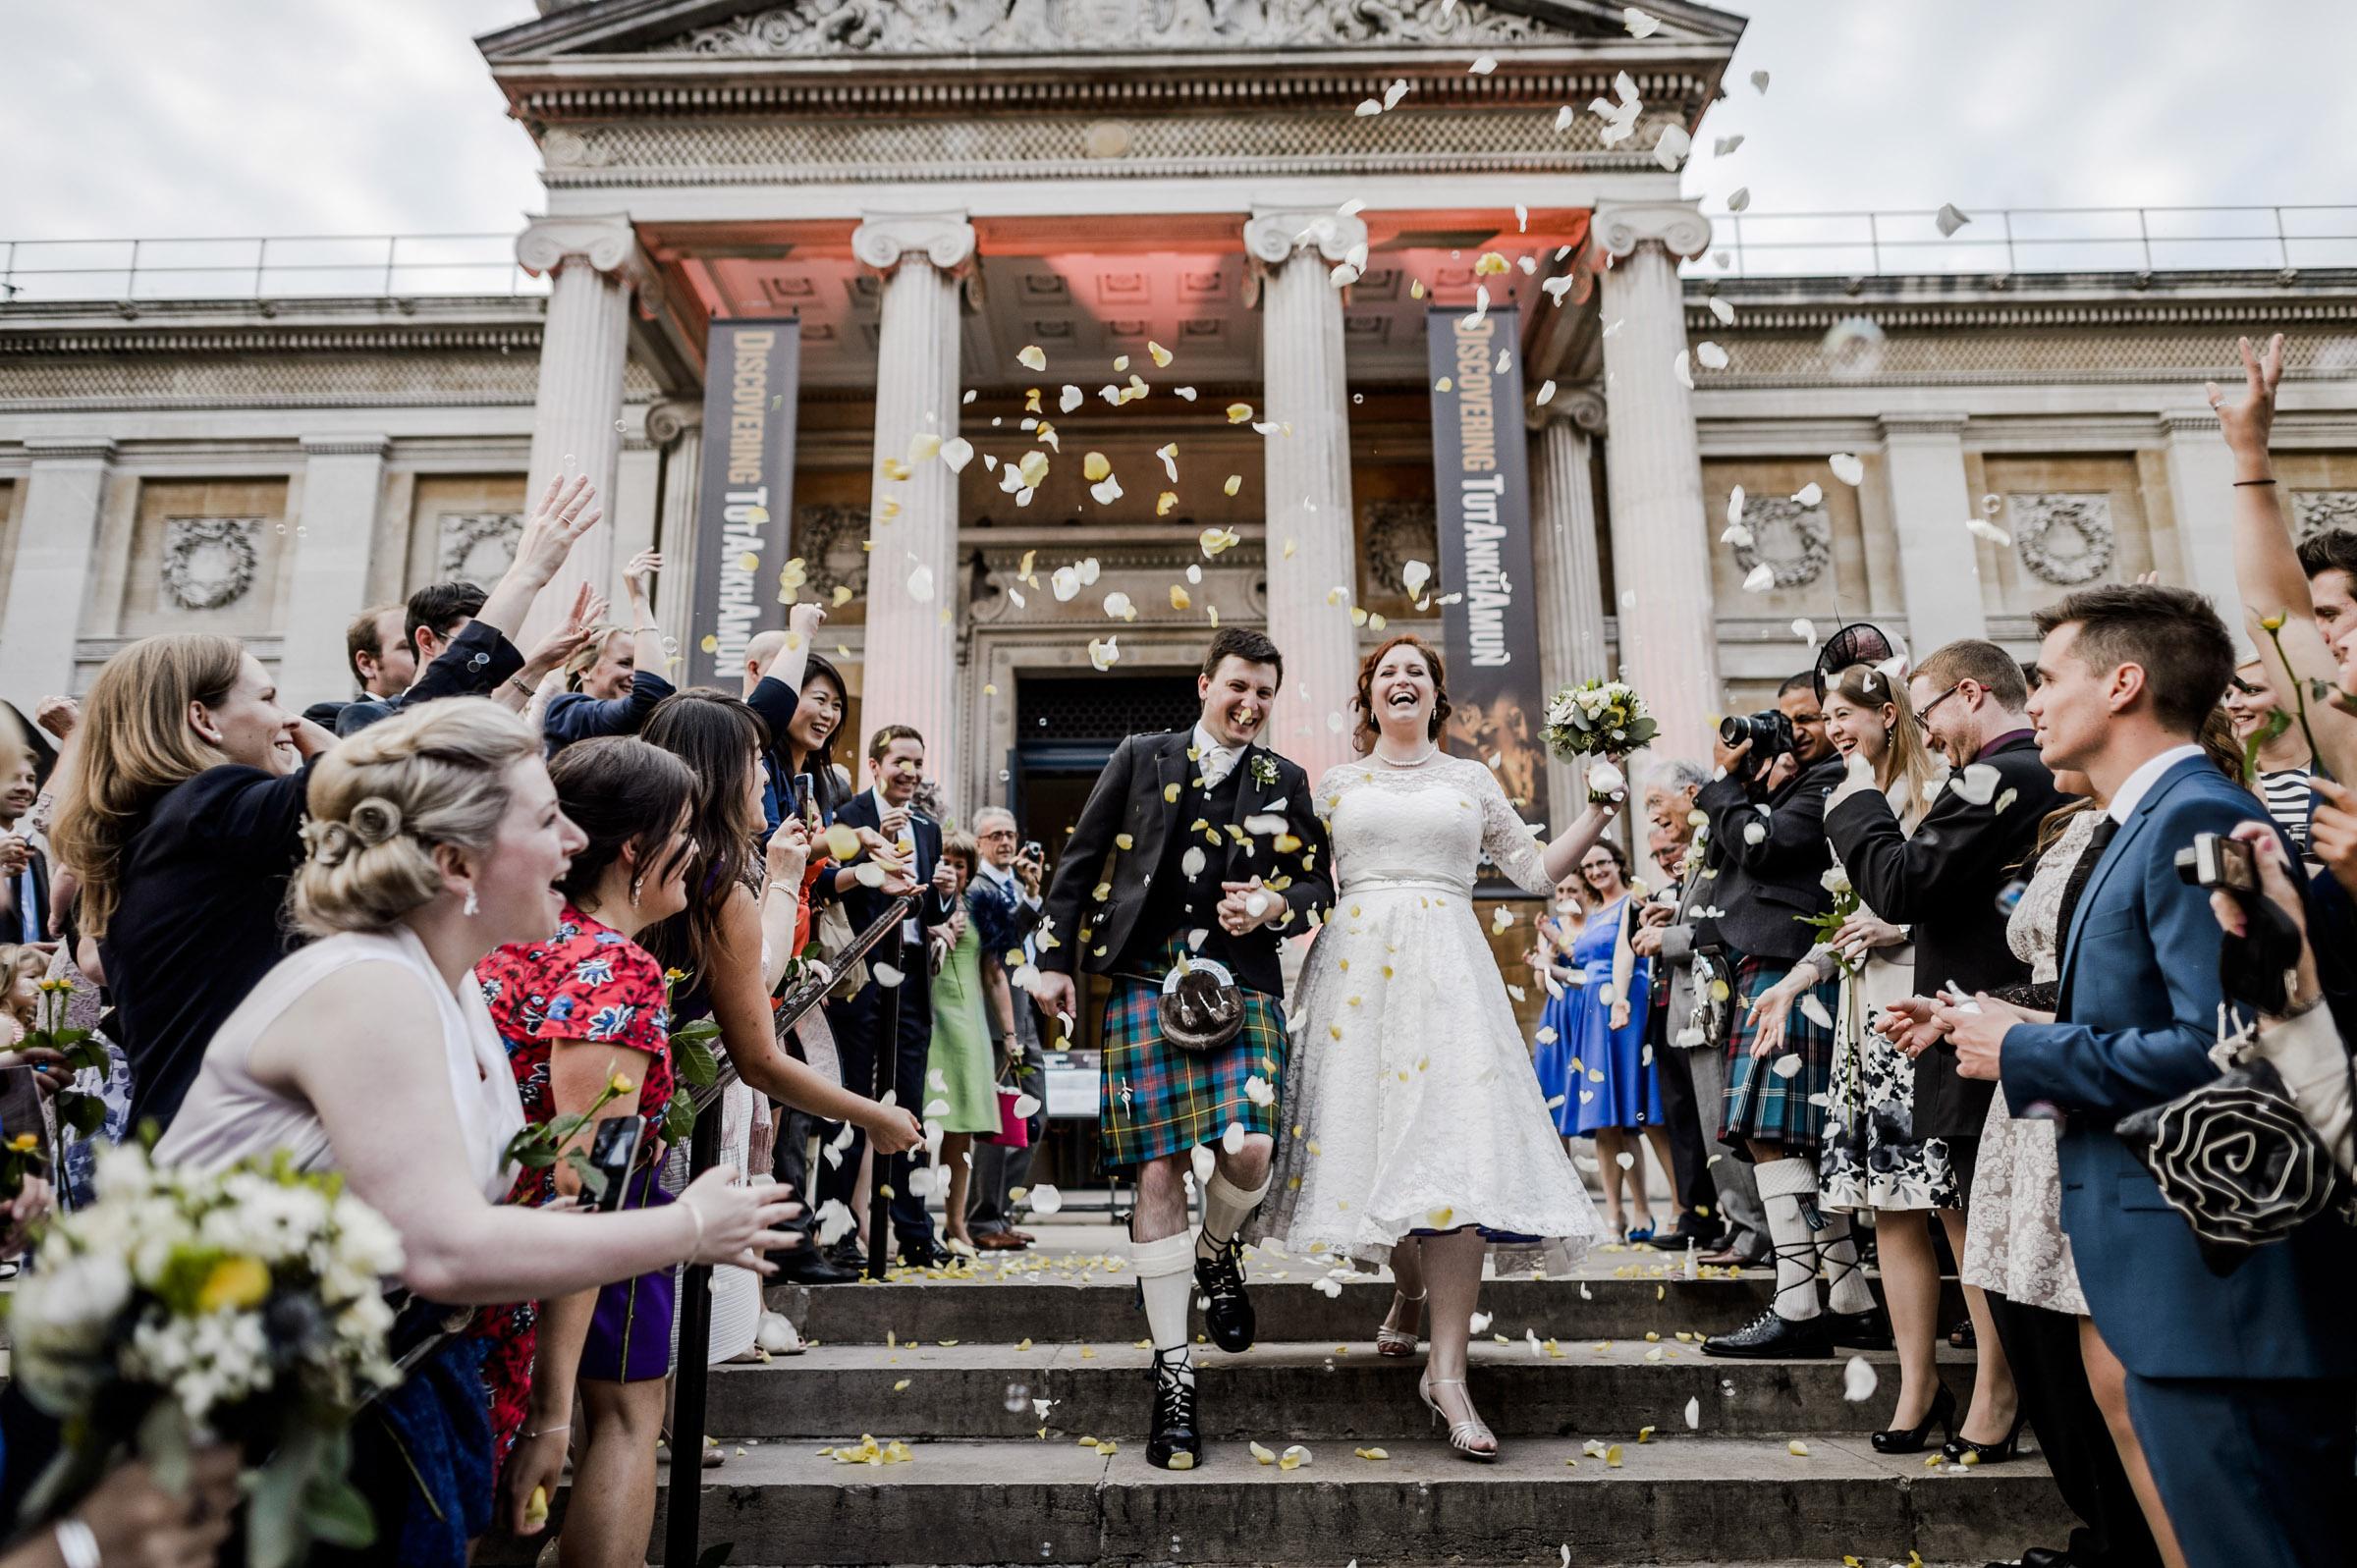 Ashmolean-Museum-Wedding-Pictures-0045.jpg